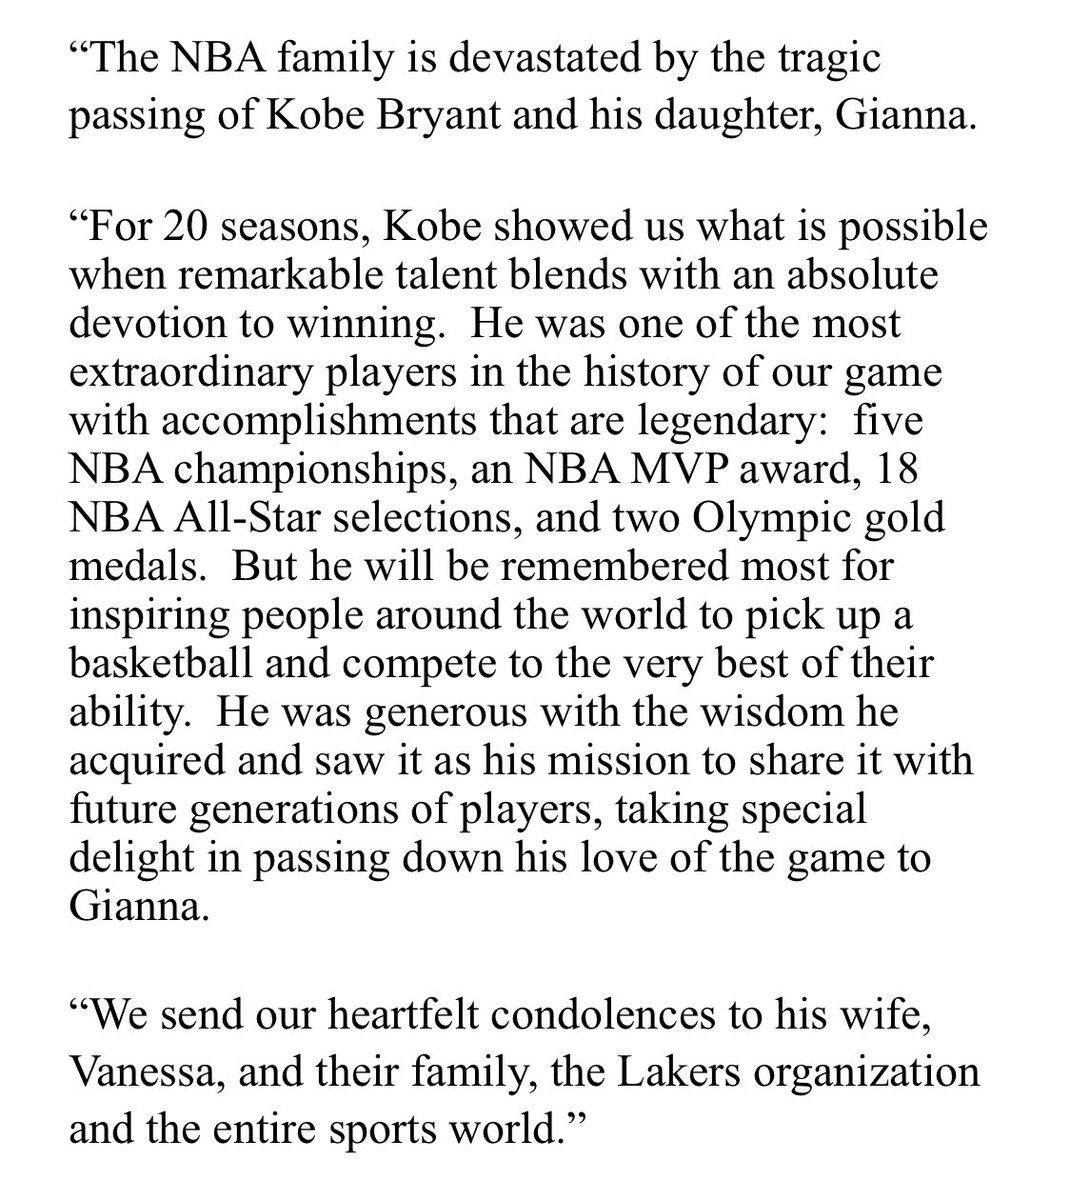 NBA commissioner Adam Silver statement on sudden death of Kobe Bryant.